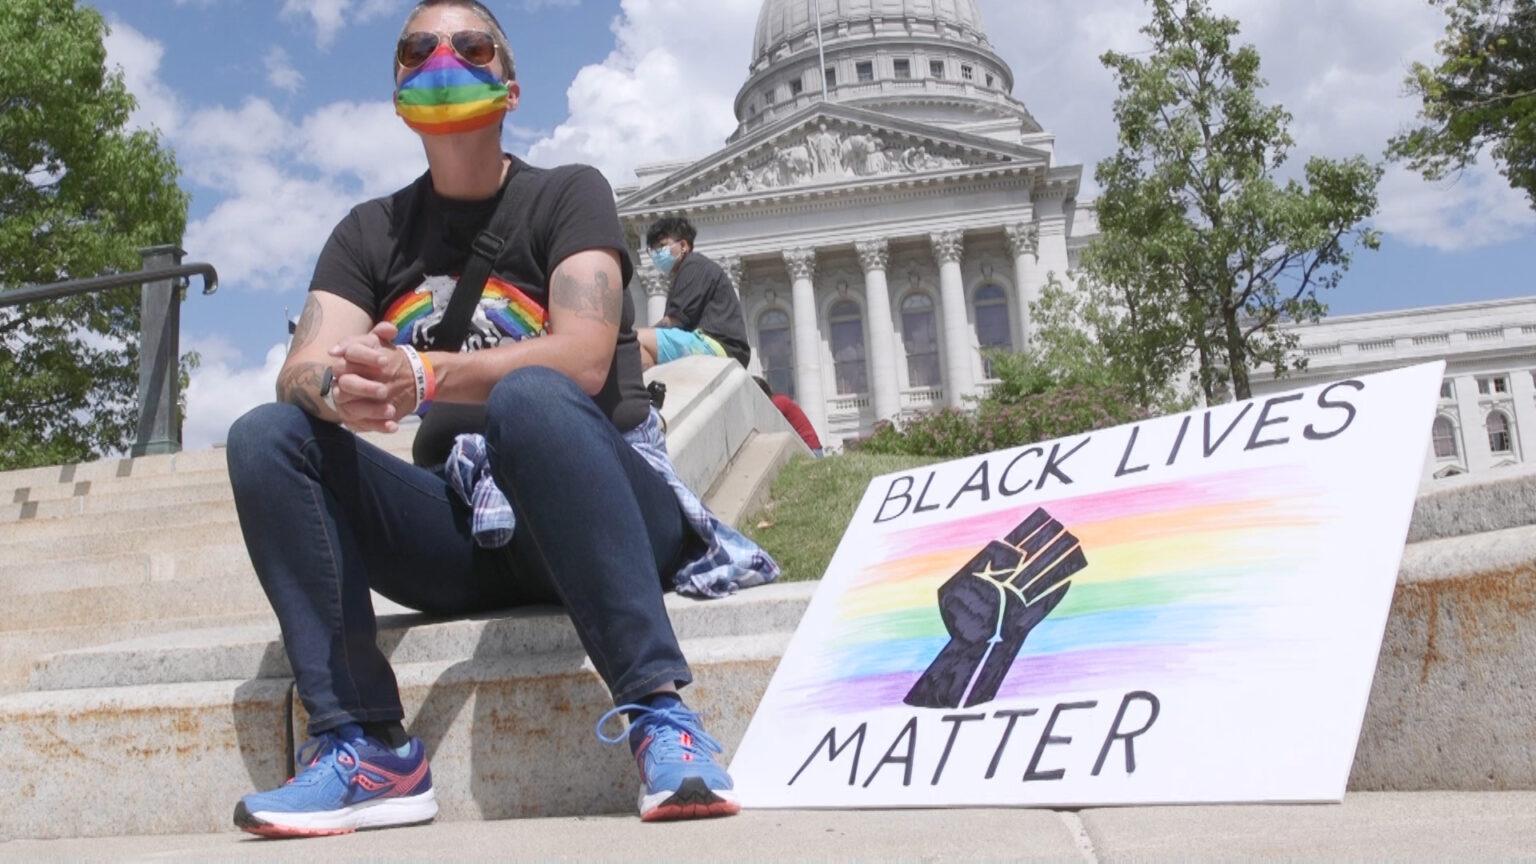 Pride/BLM rallier